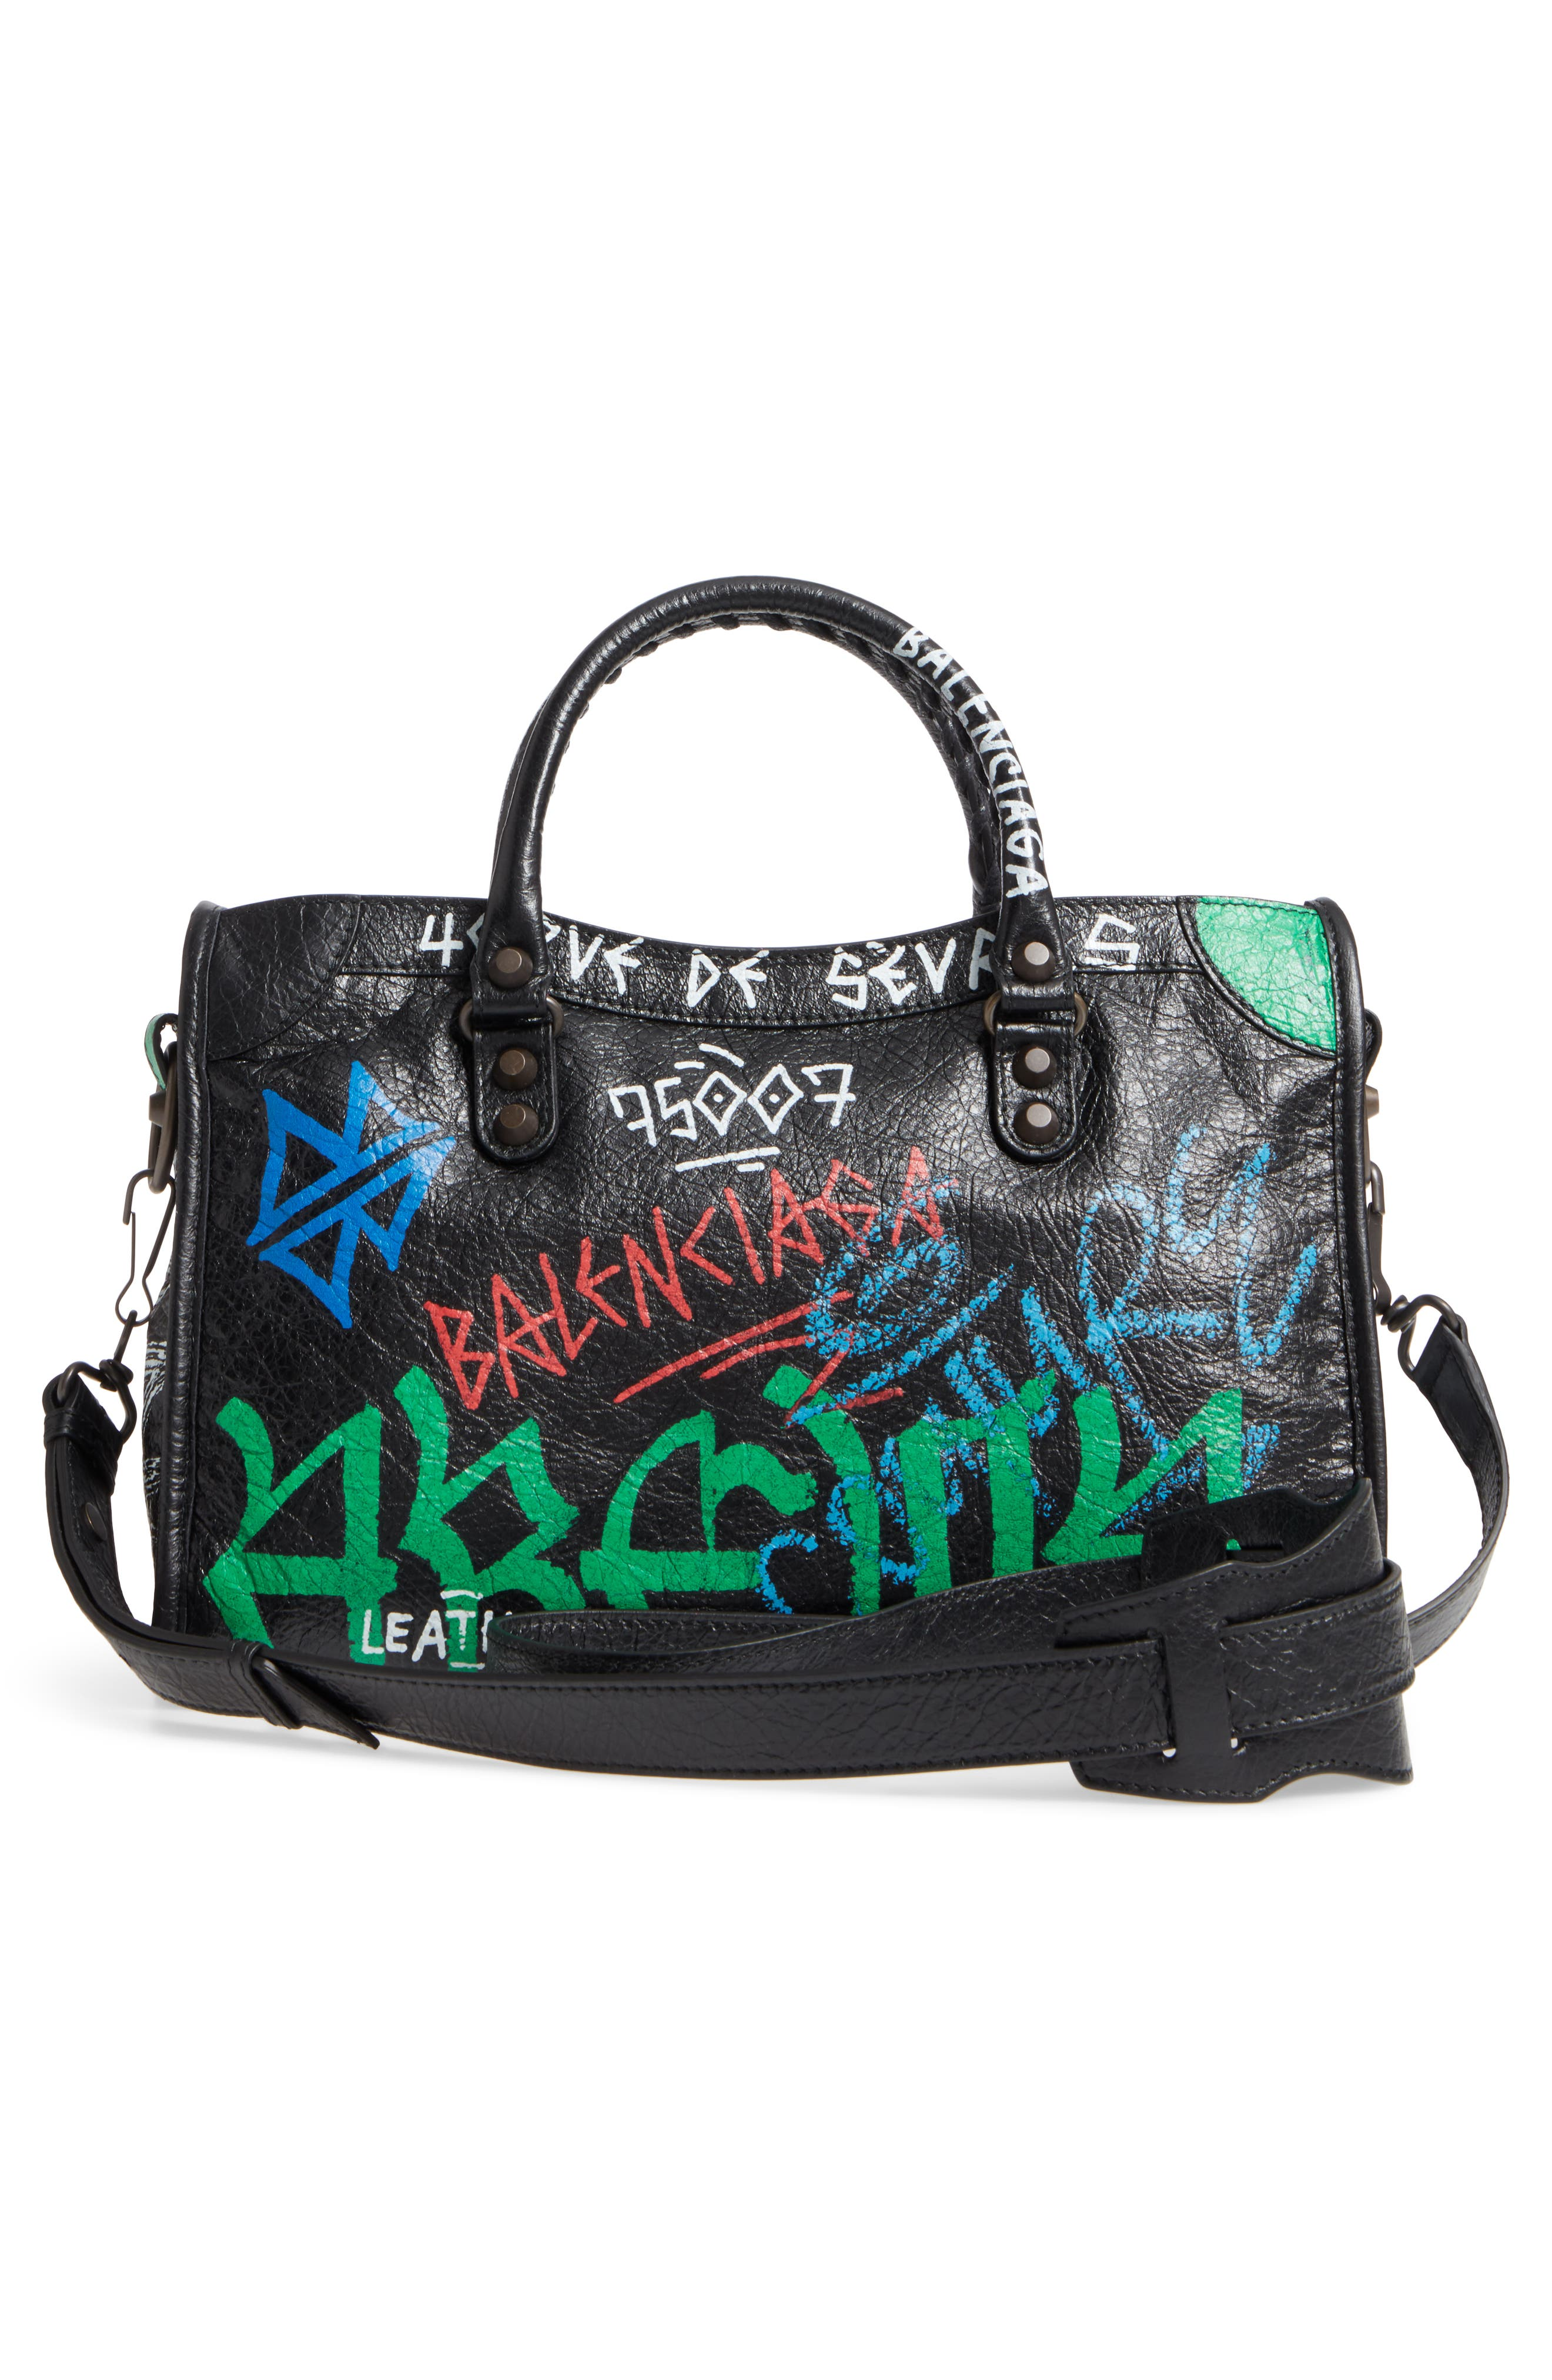 Small Classic City Graffiti Leather Tote,                             Alternate thumbnail 3, color,                             Noir/ Color